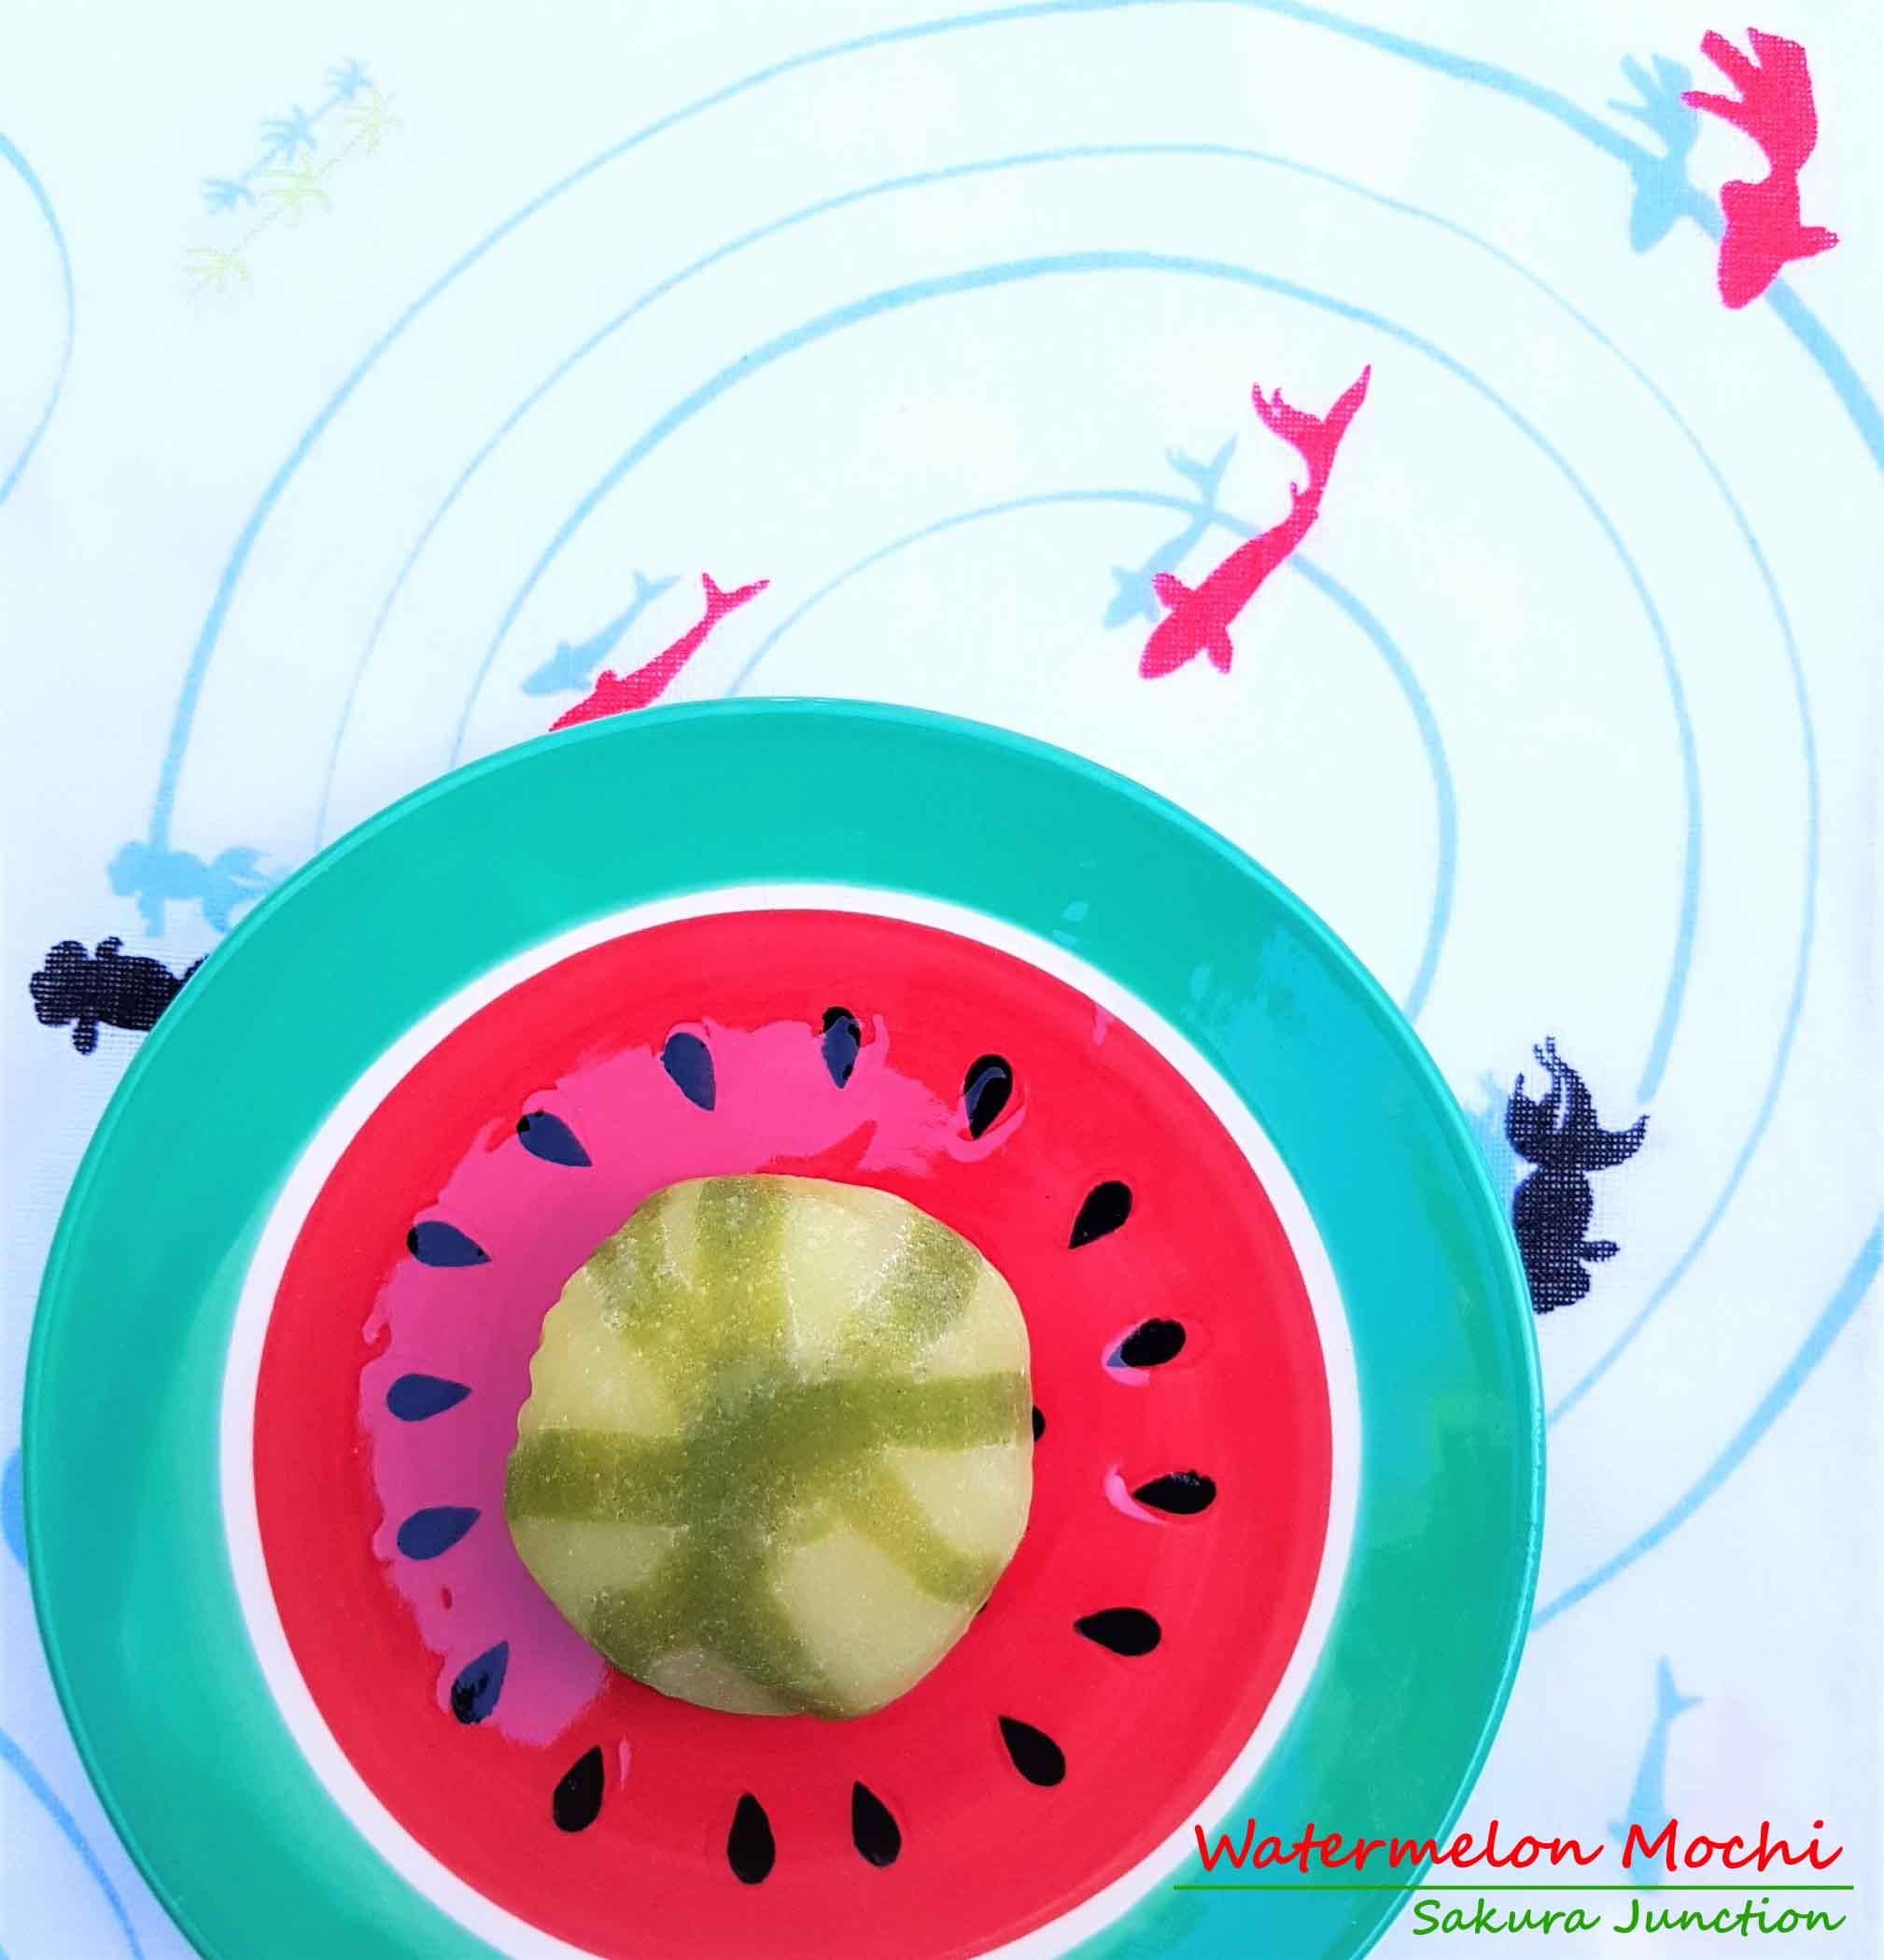 Watermelon Mochi